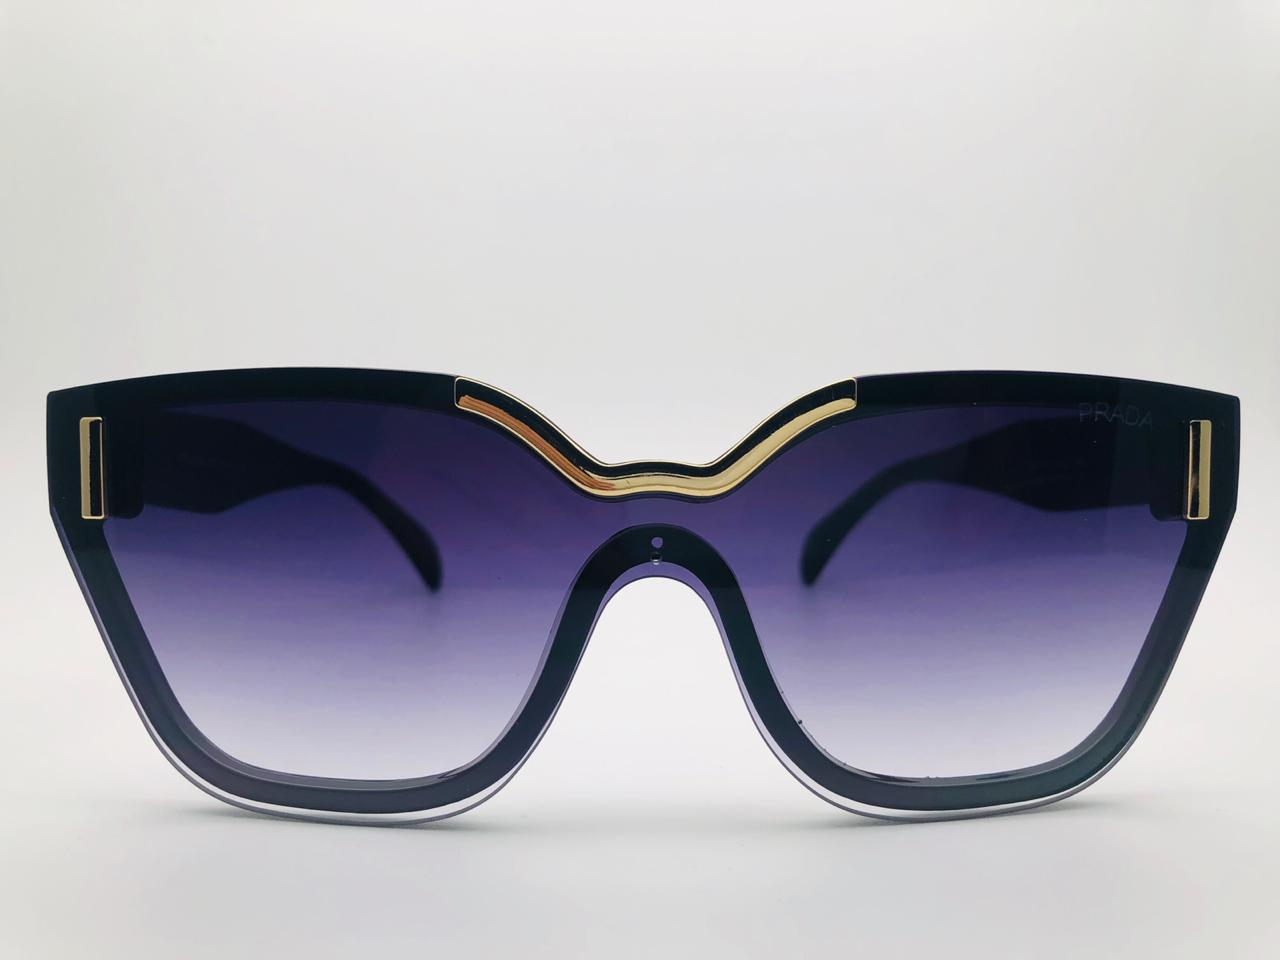 5ce6083ce0c Buy Dita Eyewear Glasses at Best Prices Online in Pakistan - daraz.pk